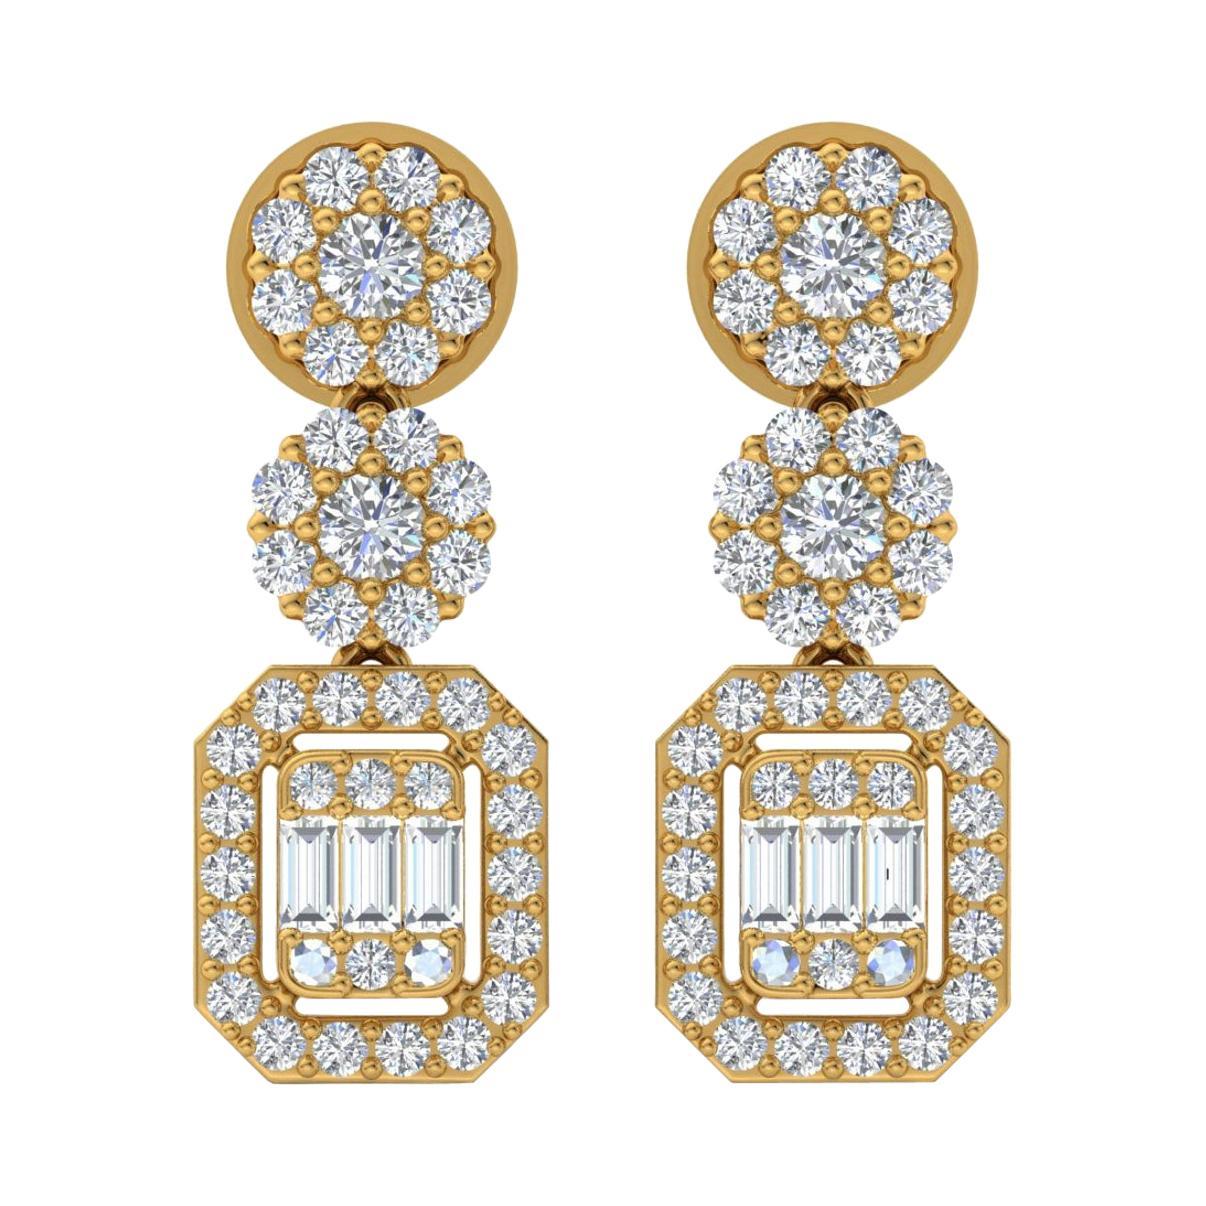 2.10 Carat Diamond 18 Karat Gold Drop Earrings